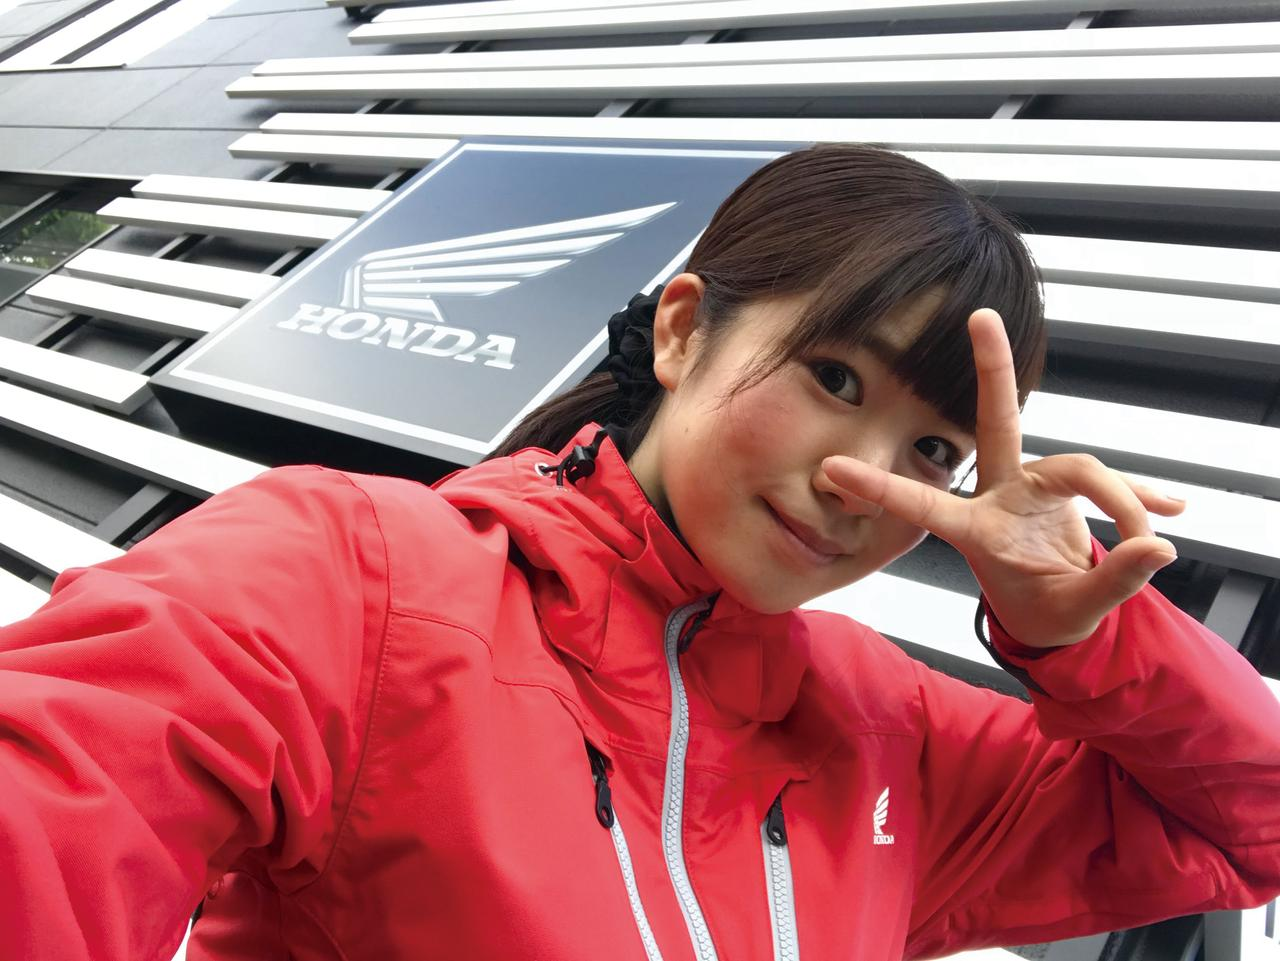 Images : 5番目の画像 - Honda Dream 仙台六丁の目 - webオートバイ